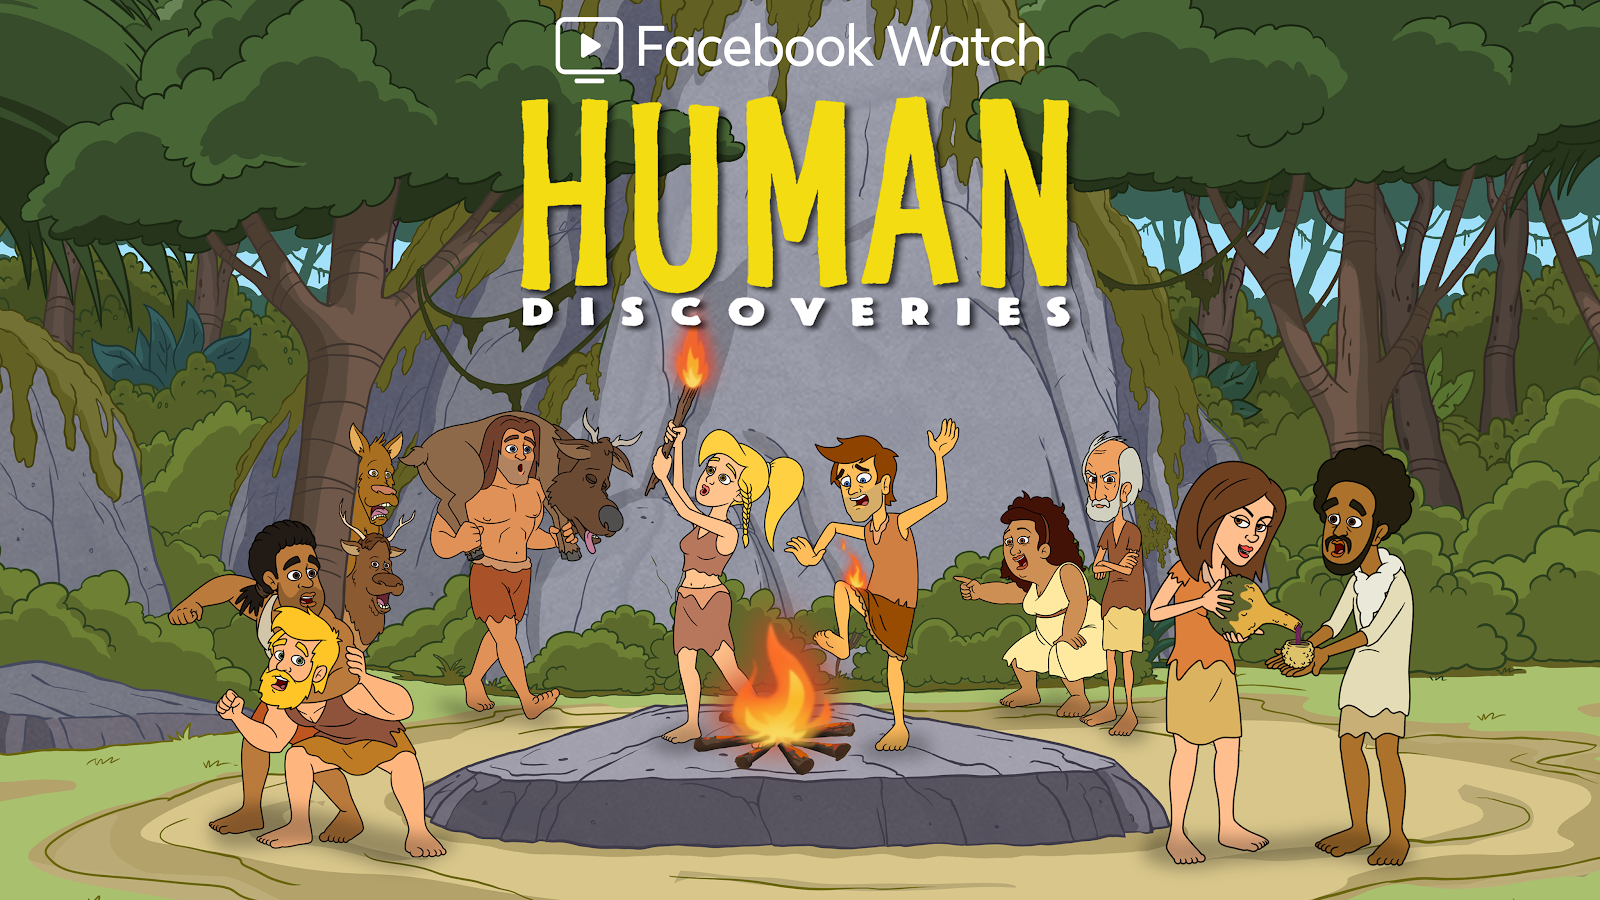 Human Discoveries Facebook